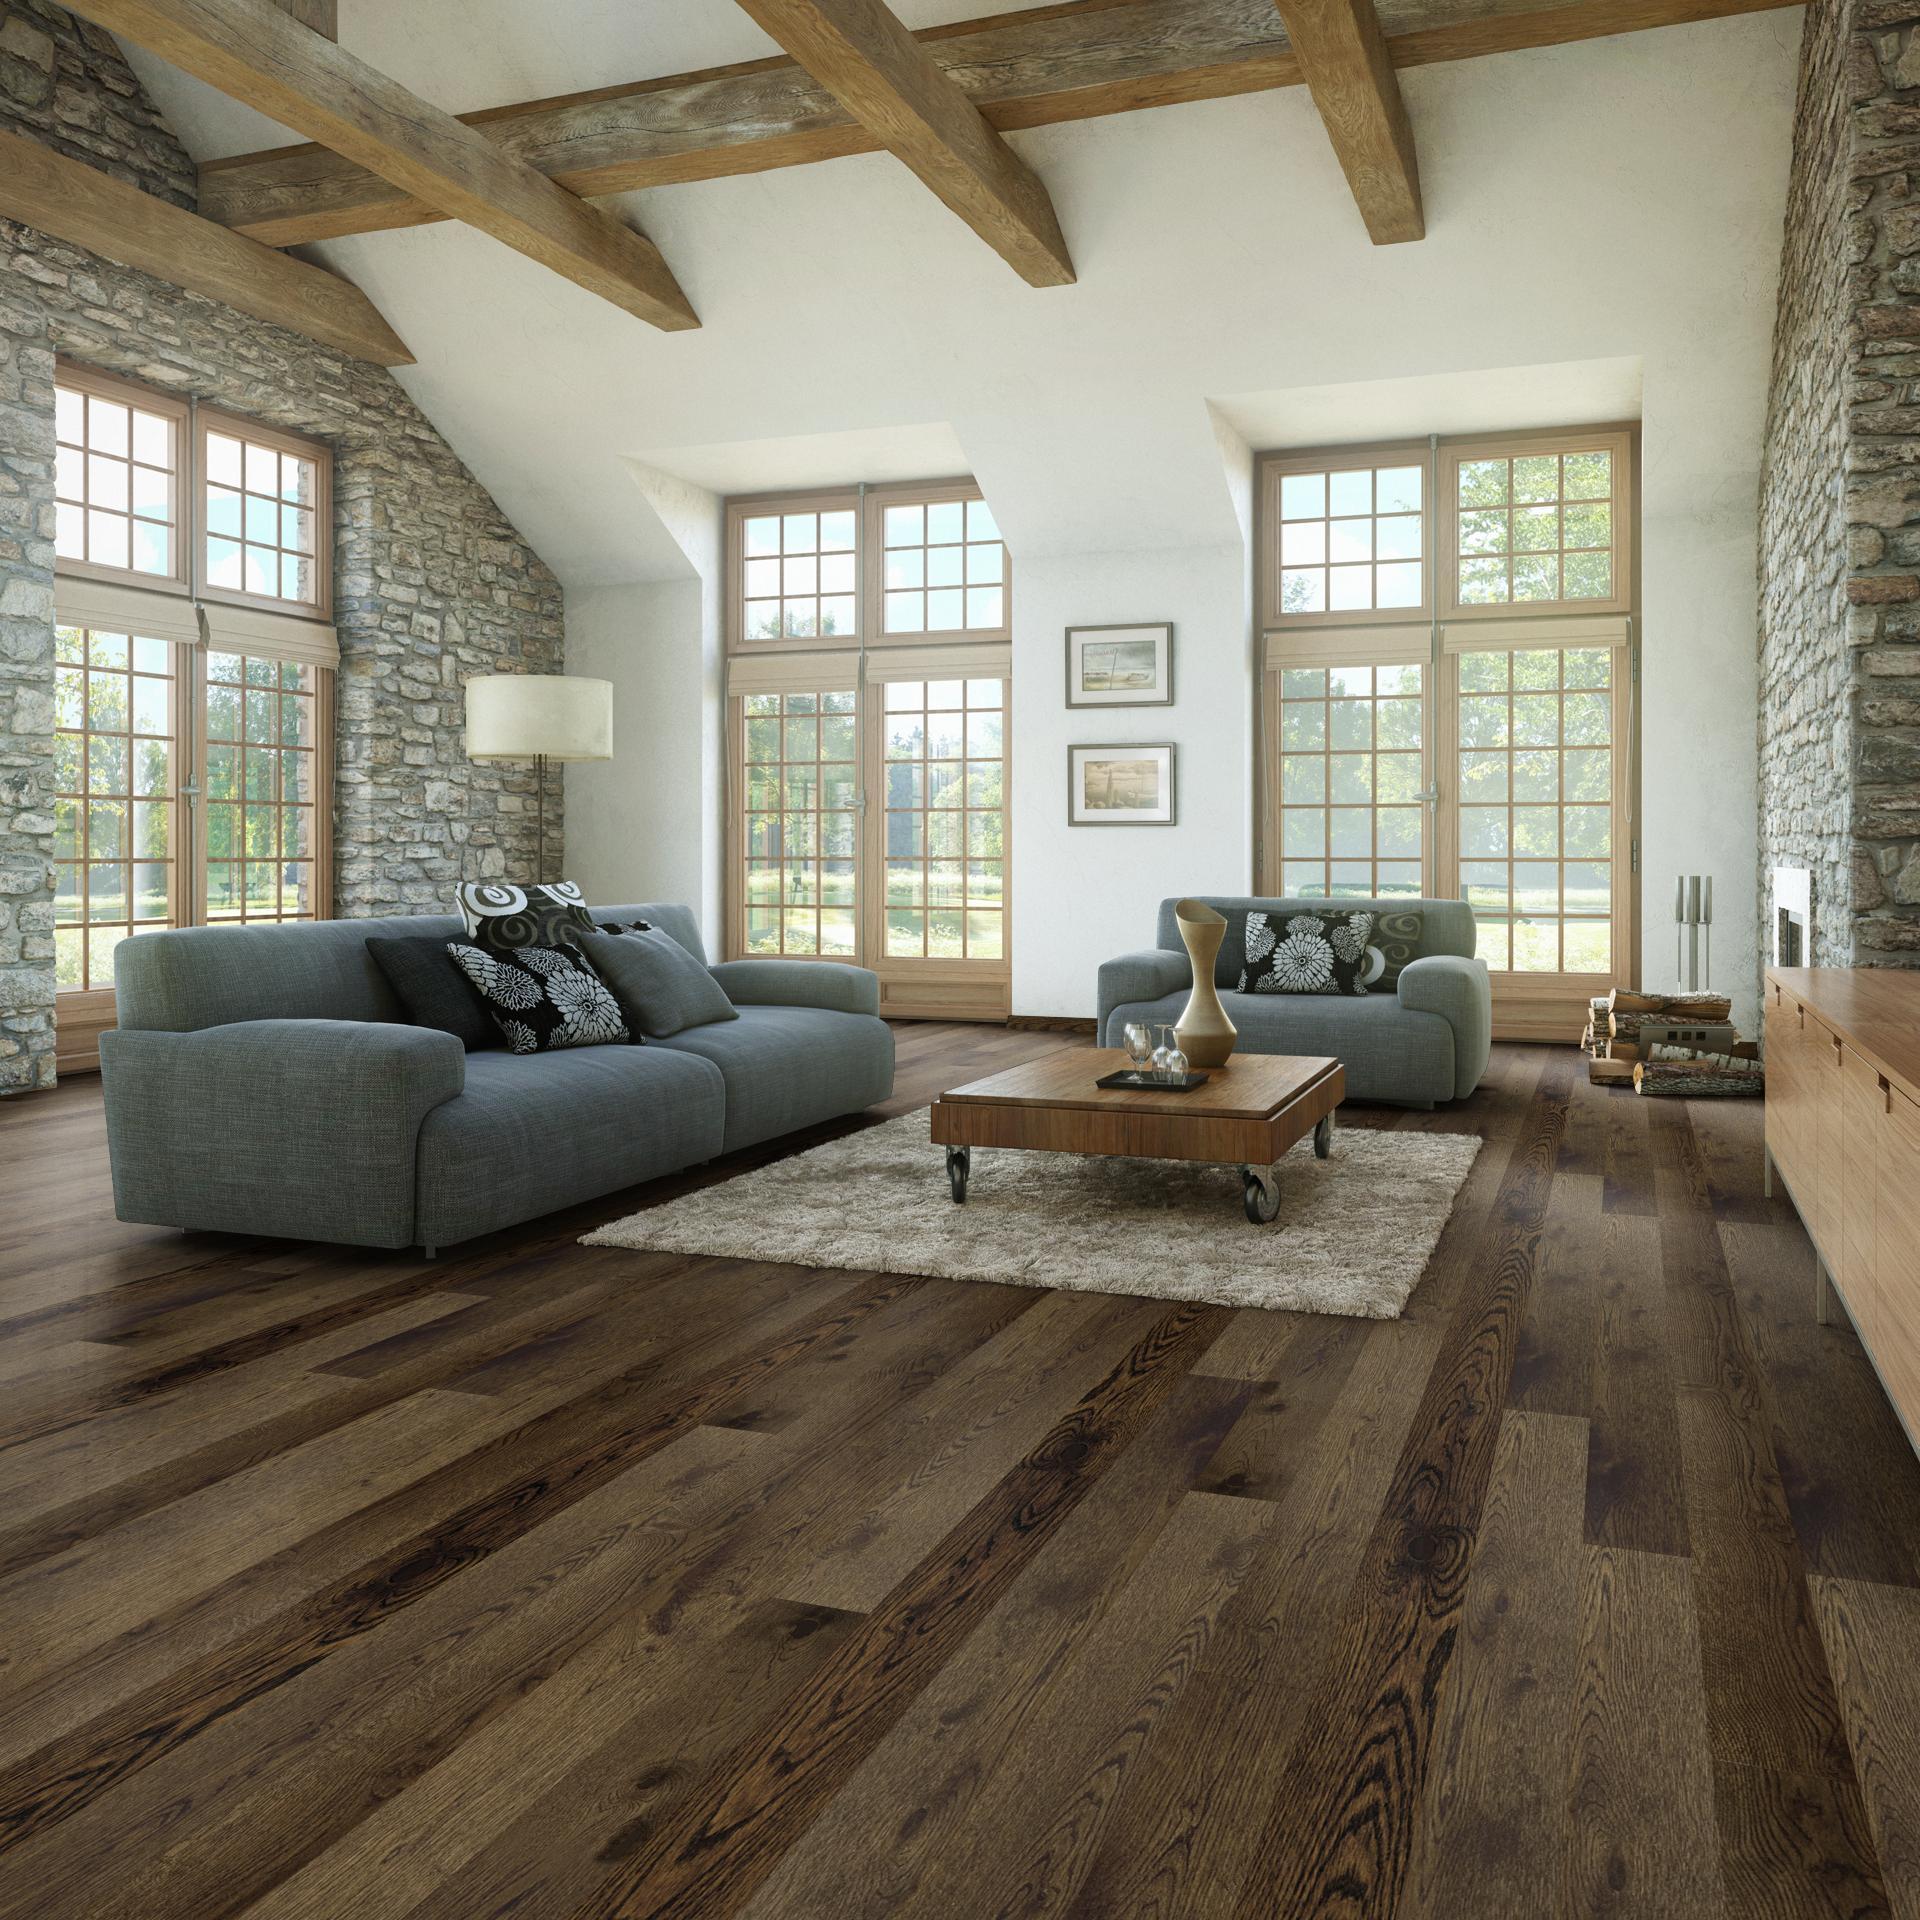 Podloga drewniana inspiracje 11